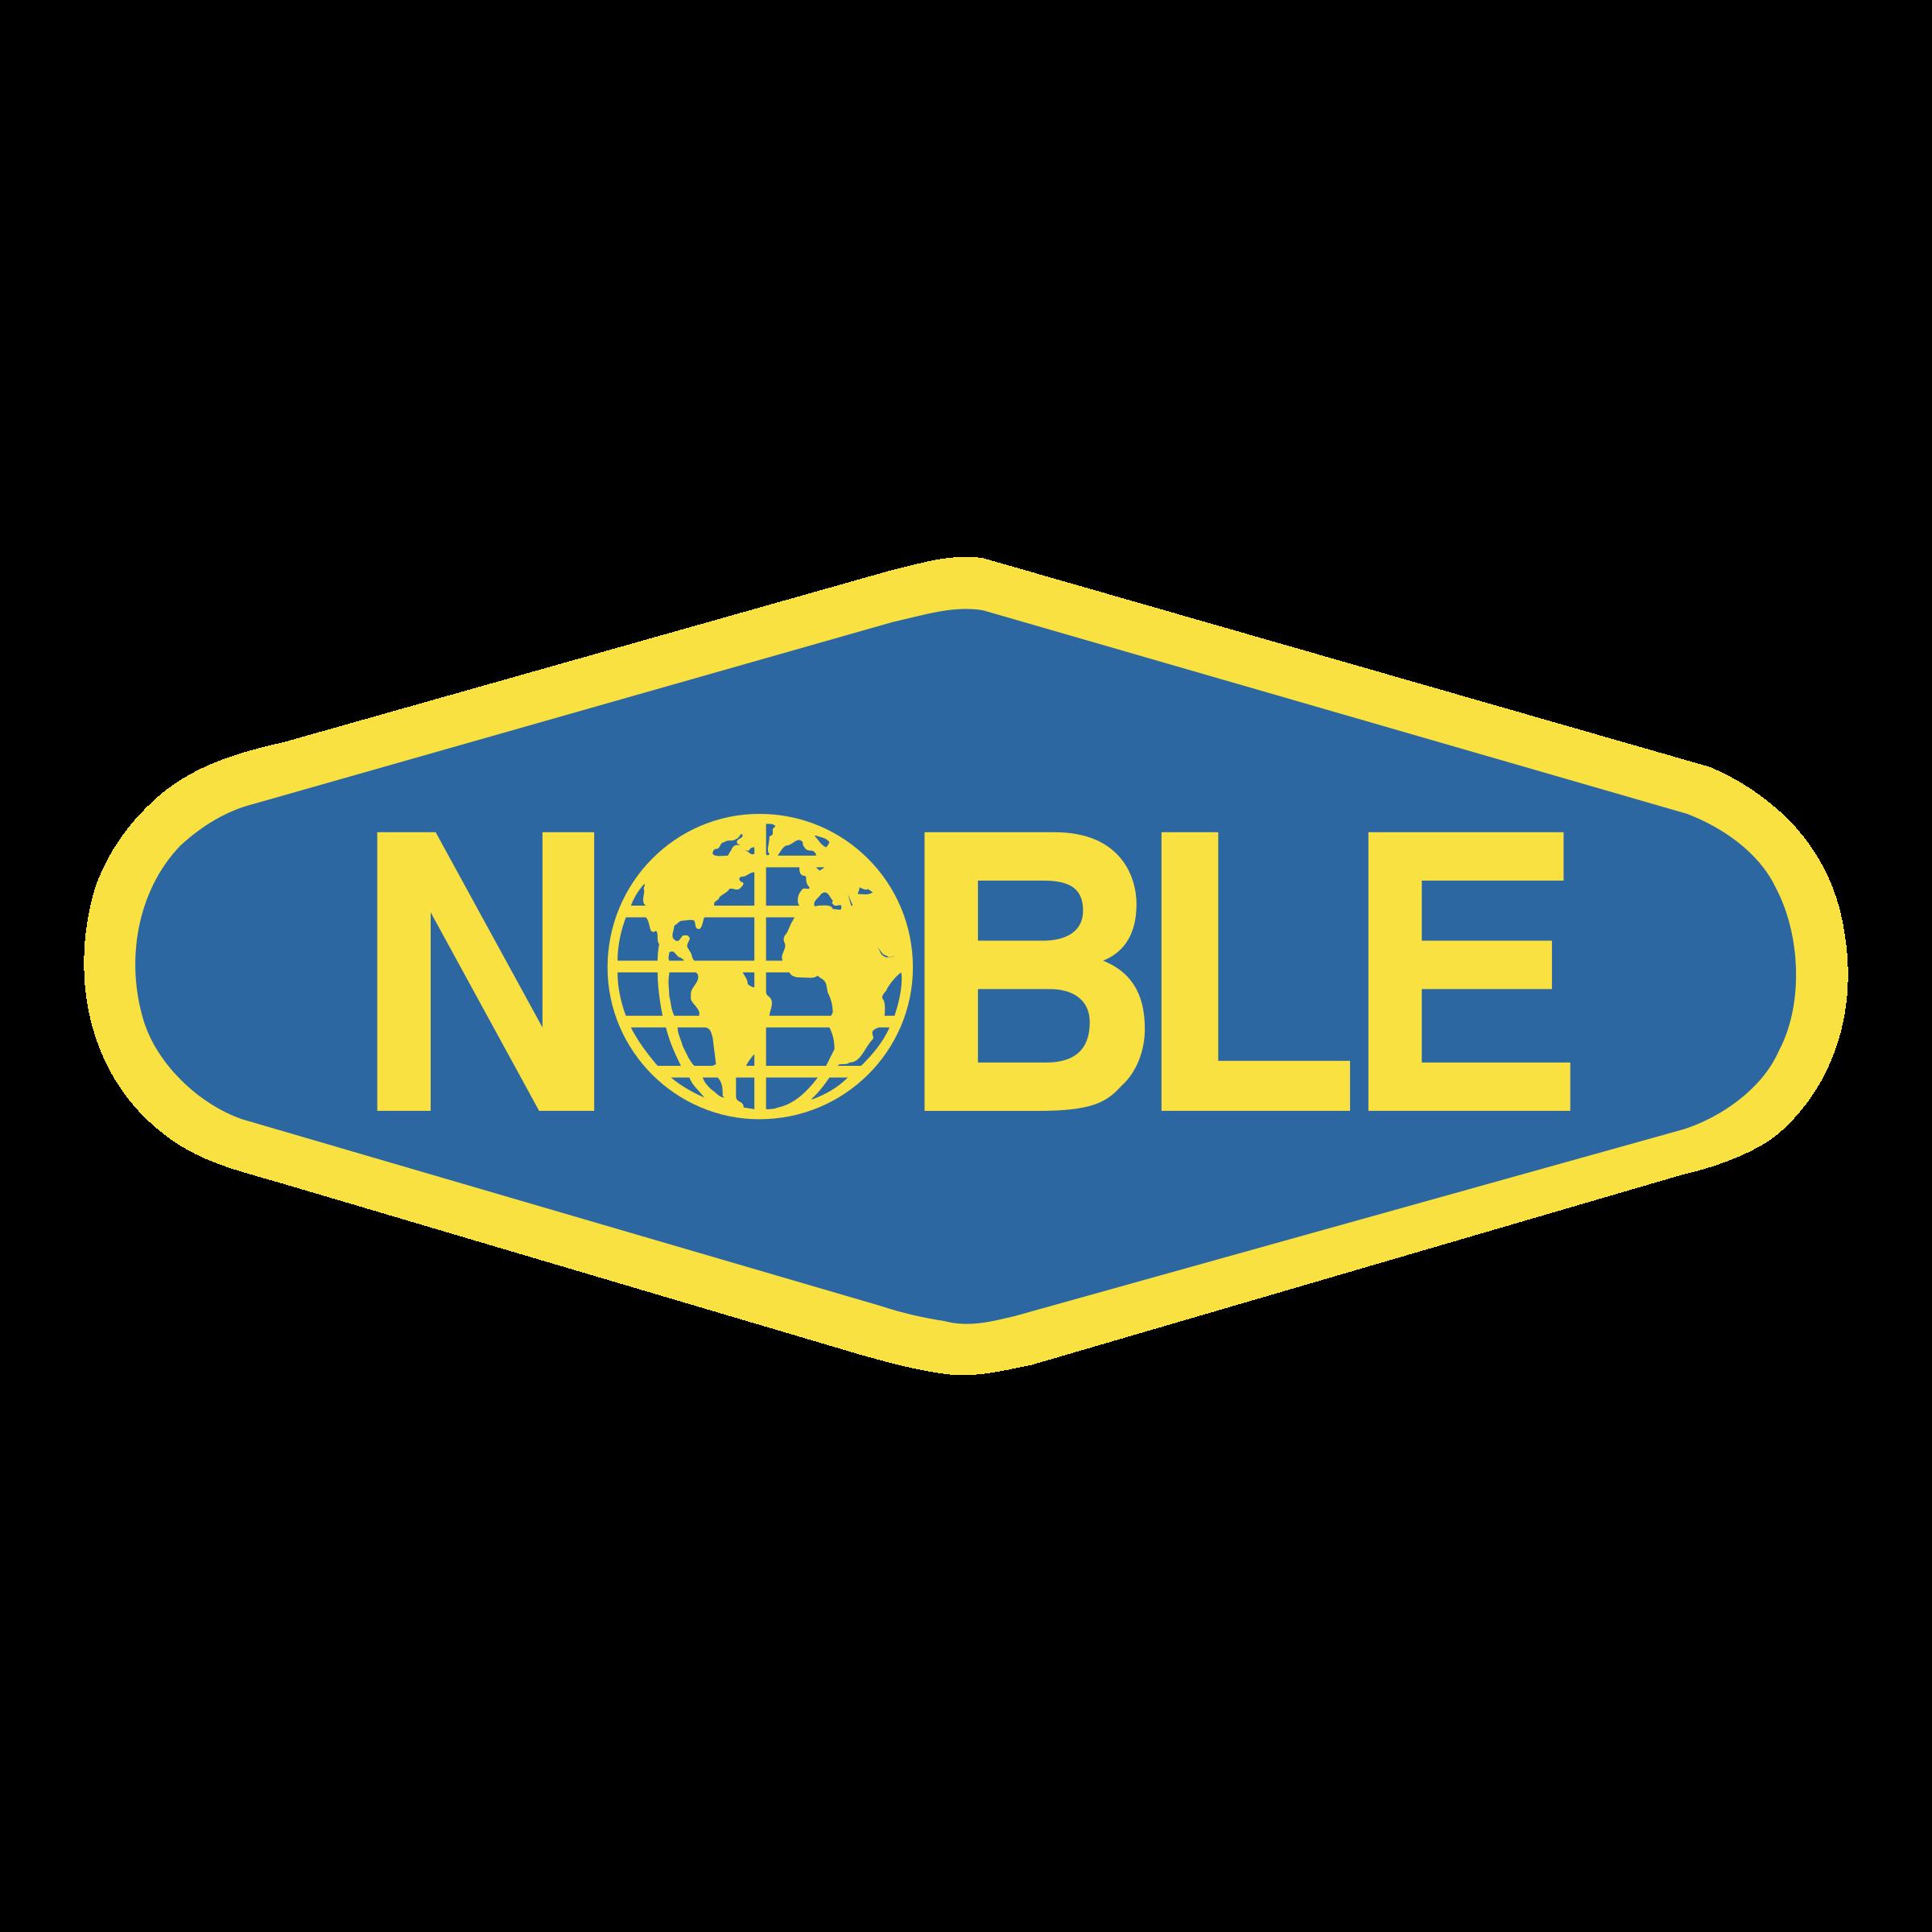 Noble Logo PNG Transparent & SVG Vector - Freebie Supply  Noble Logo PNG ...